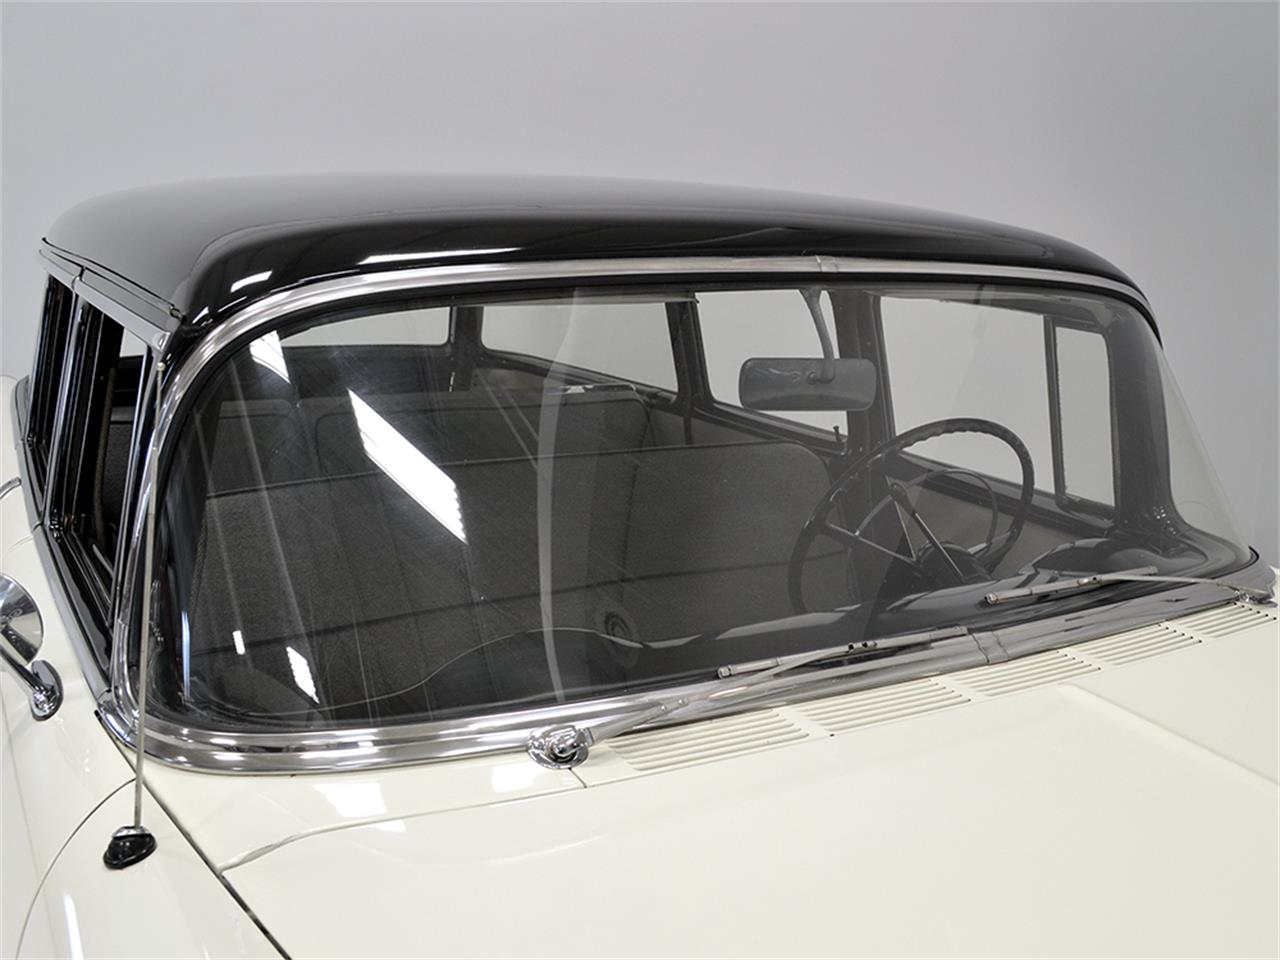 Large Picture of '56 Chevrolet 210 Offered by Harwood Motors, LTD. - K2KS